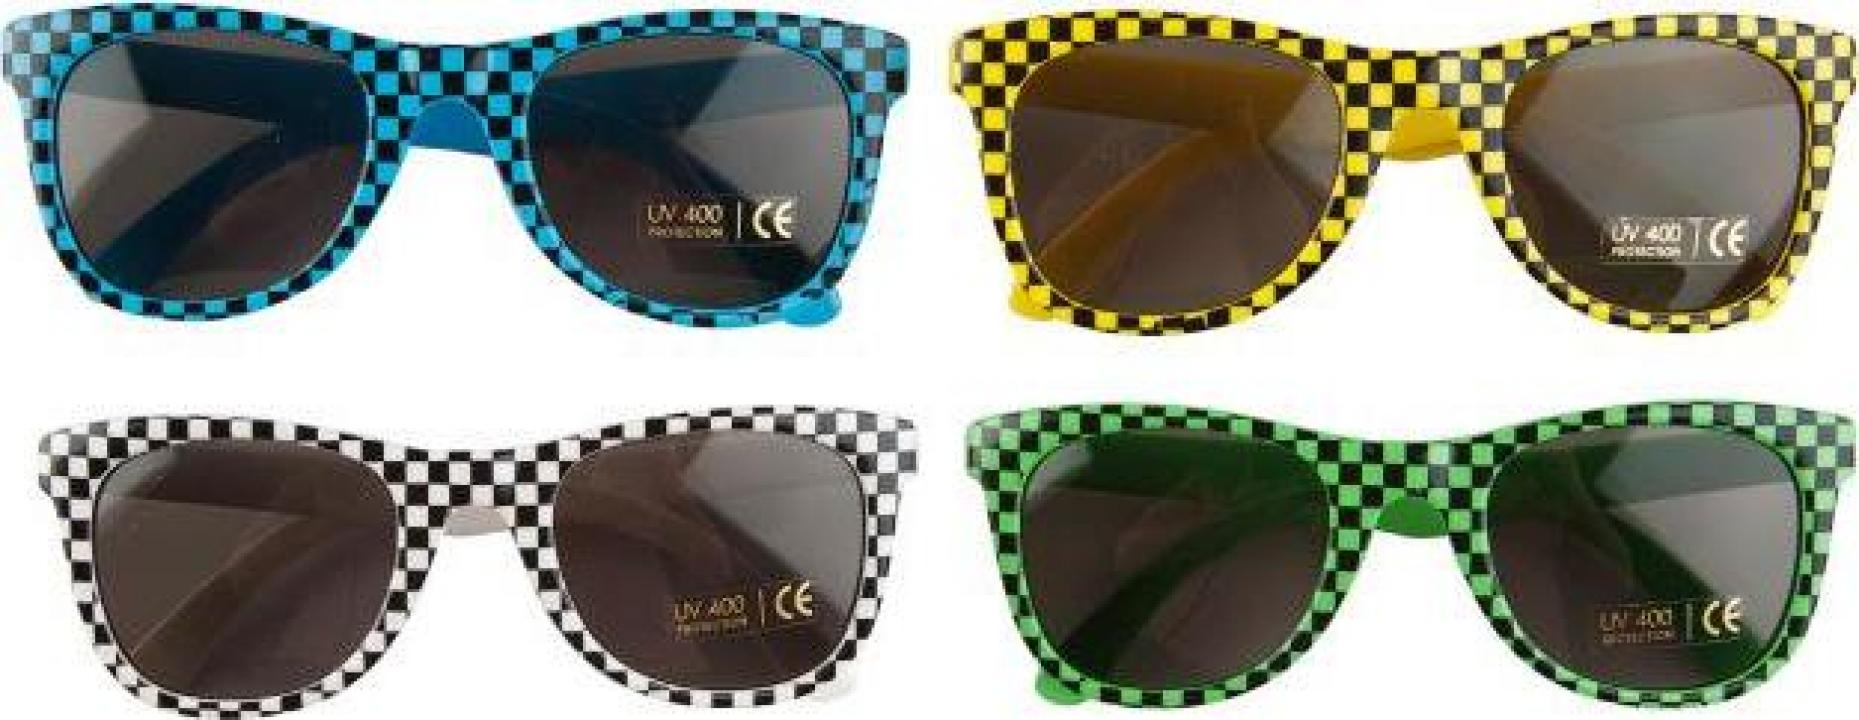 Ochelari de soare copii - UV400